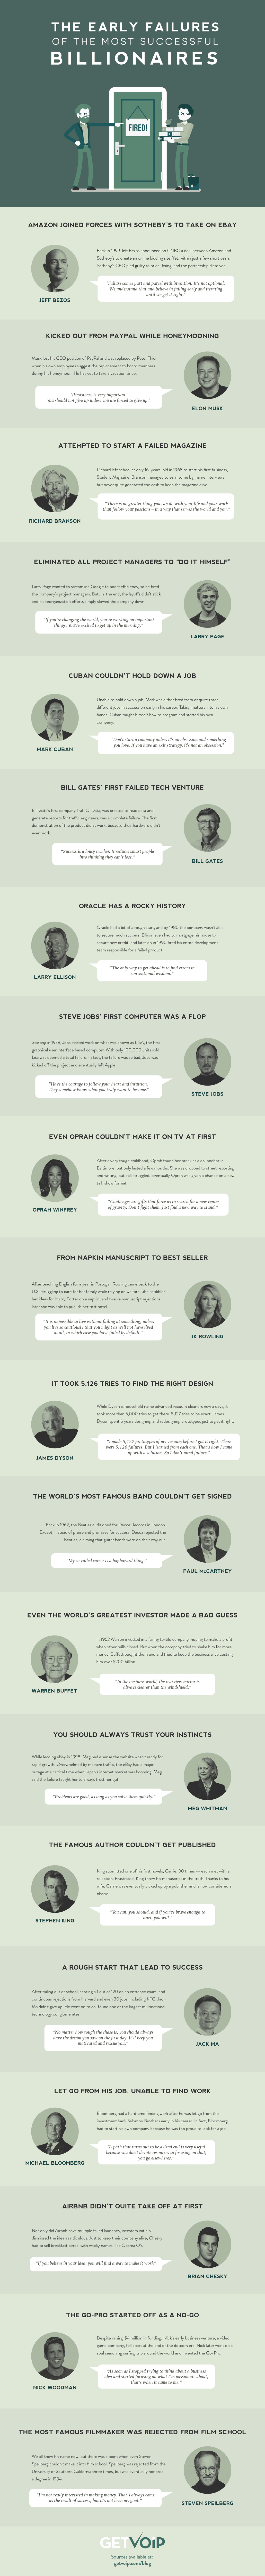 billionaire-early-career-failures-infographic